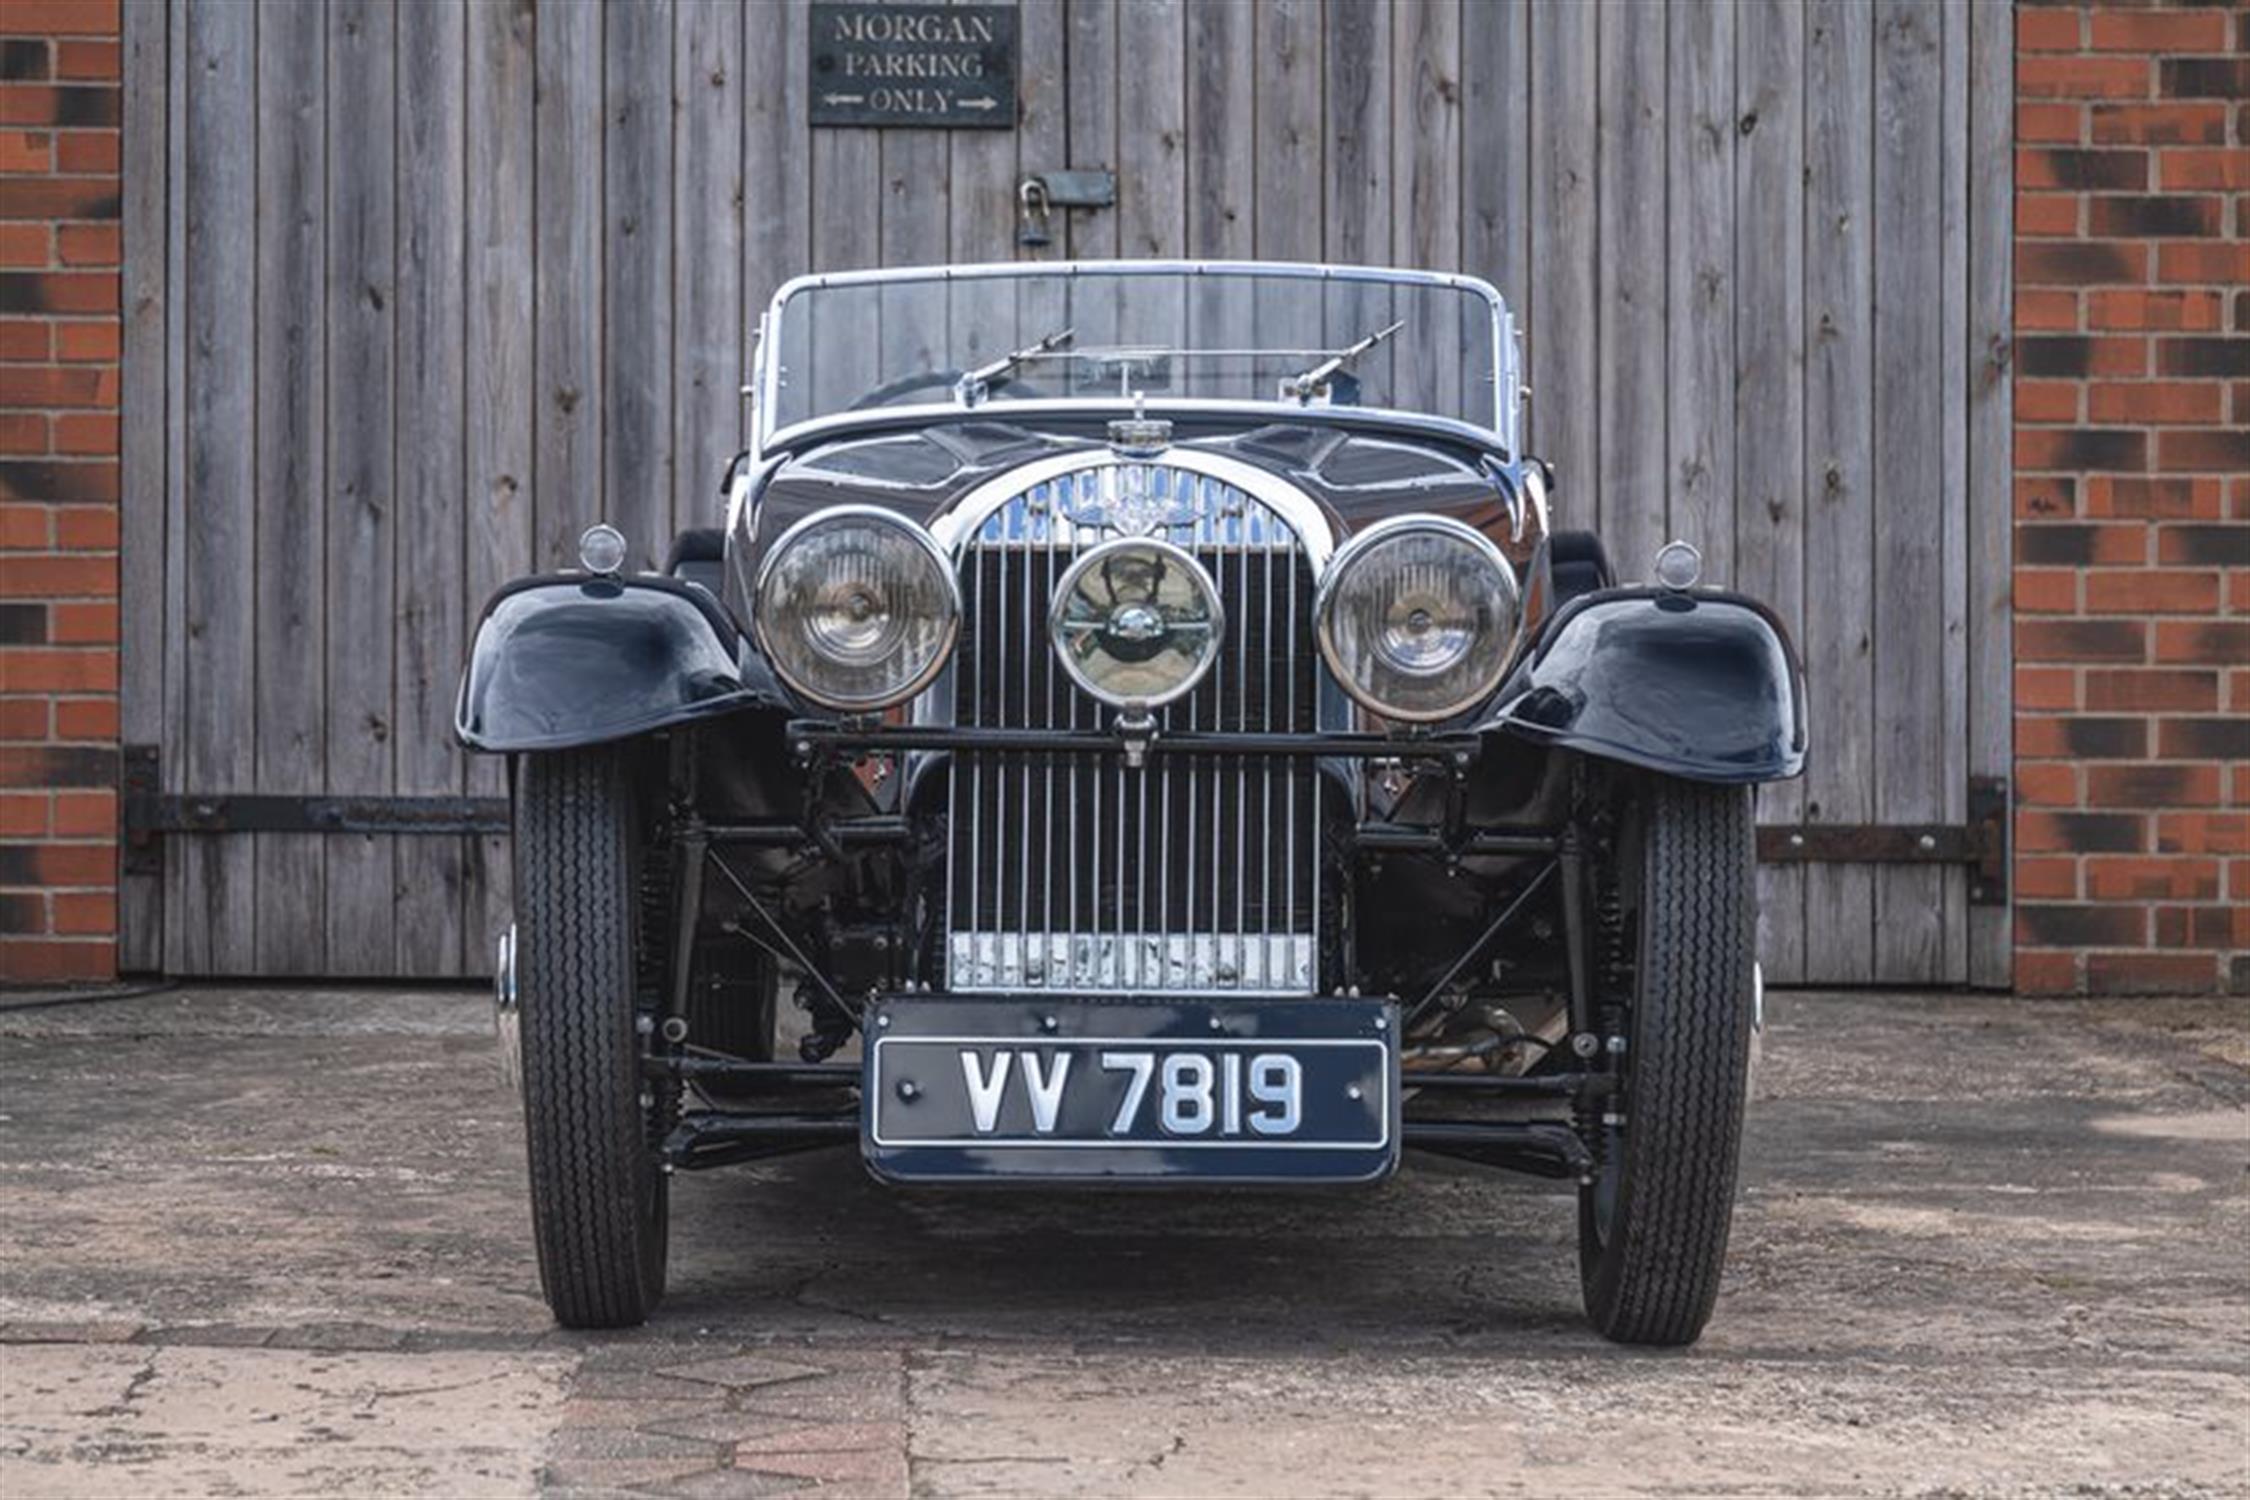 1939 Morgan 4/4 Series 1 'Flat Rad' (1098cc Climax Engine) - Image 2 of 10